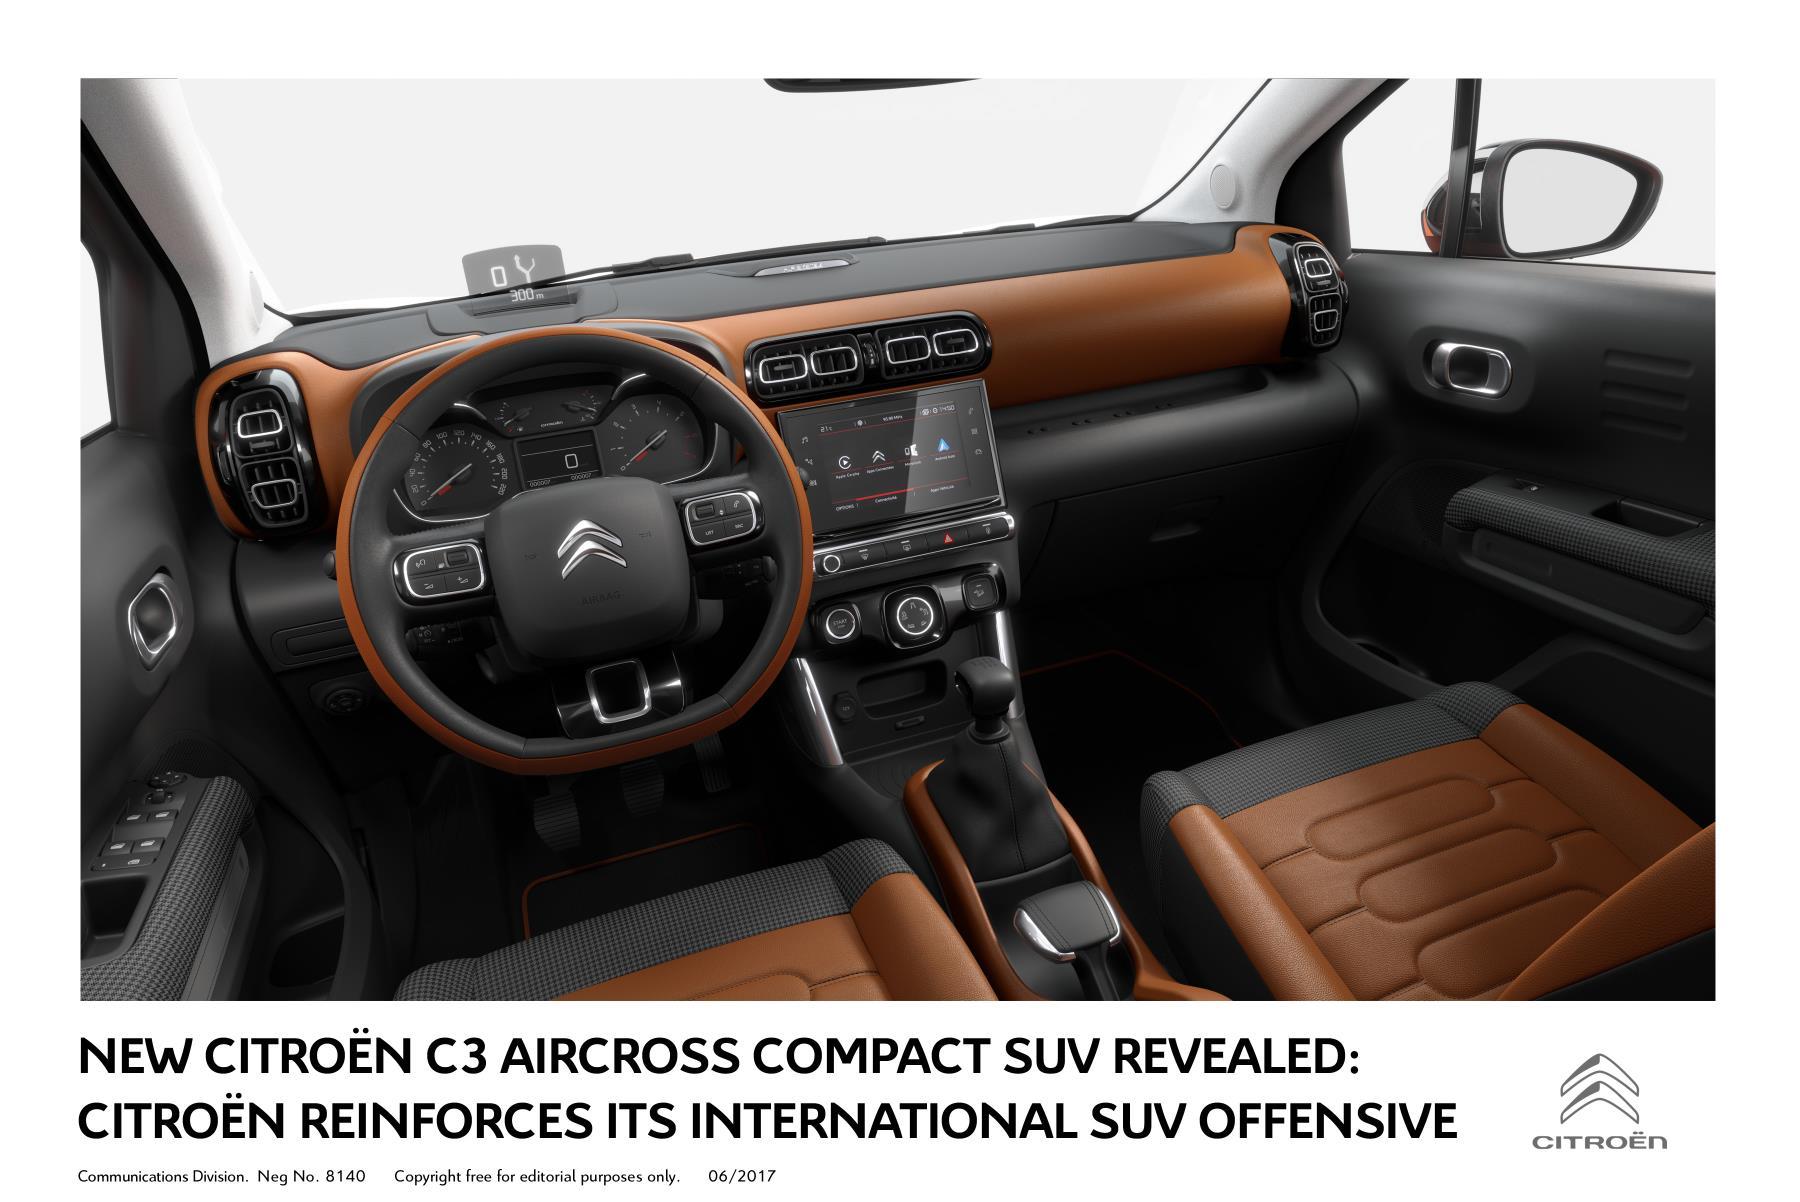 Citroen Automaker Releases of C3 Aircross B Segment SUV